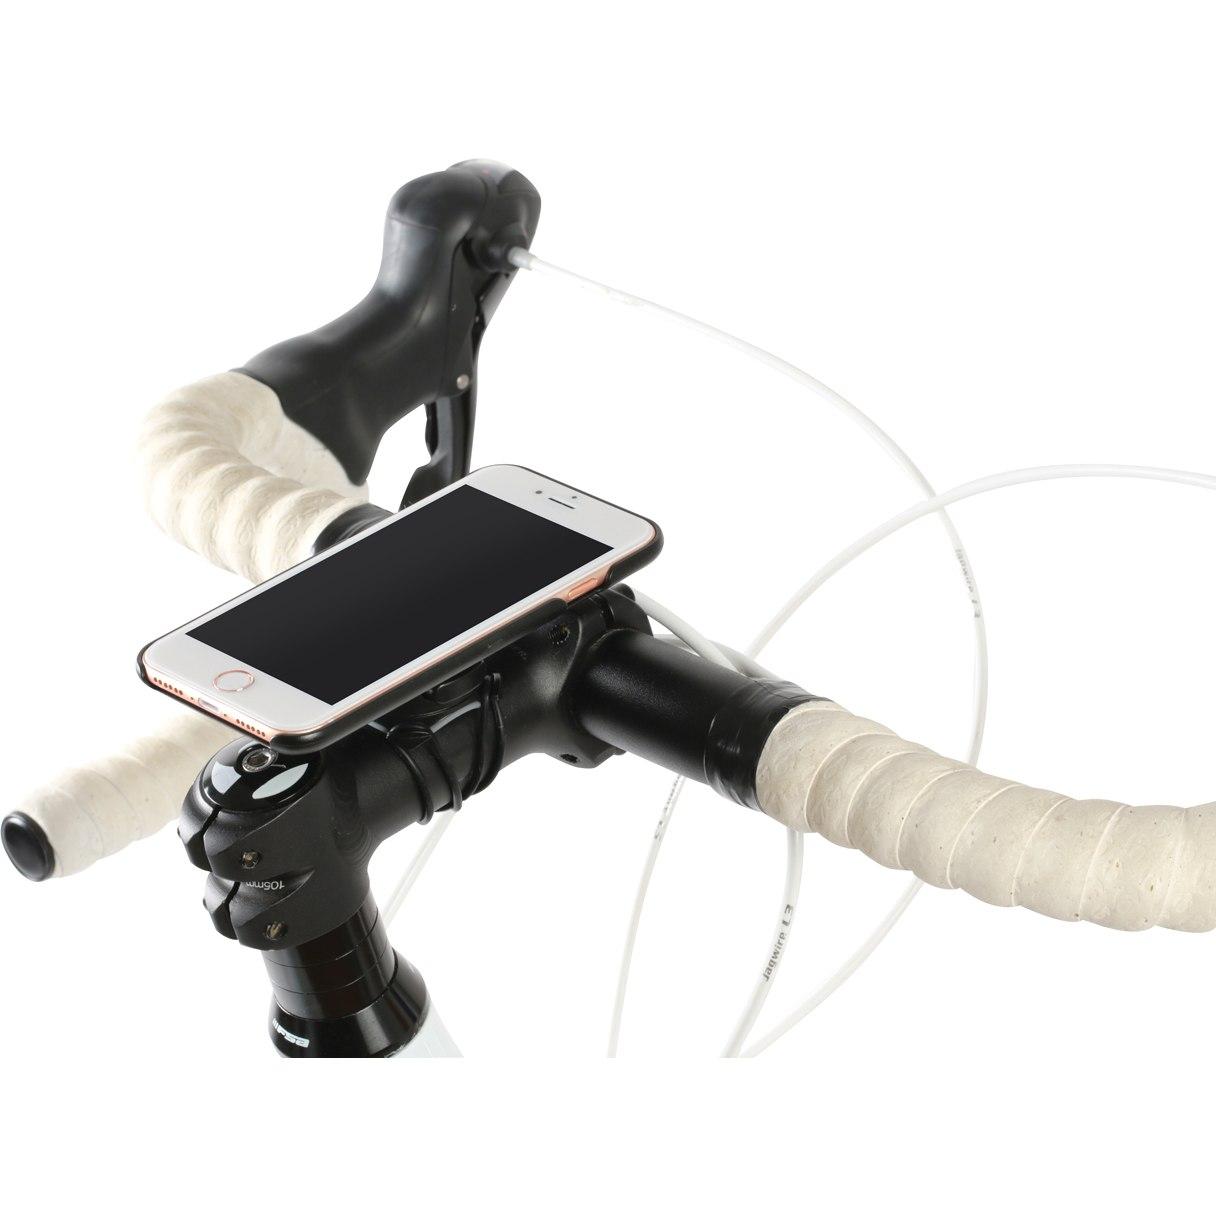 Zéfal Z-Console Full Kit iPhone 7 / 7+ / 8 / 8+ / X - Smartphone-Halterung